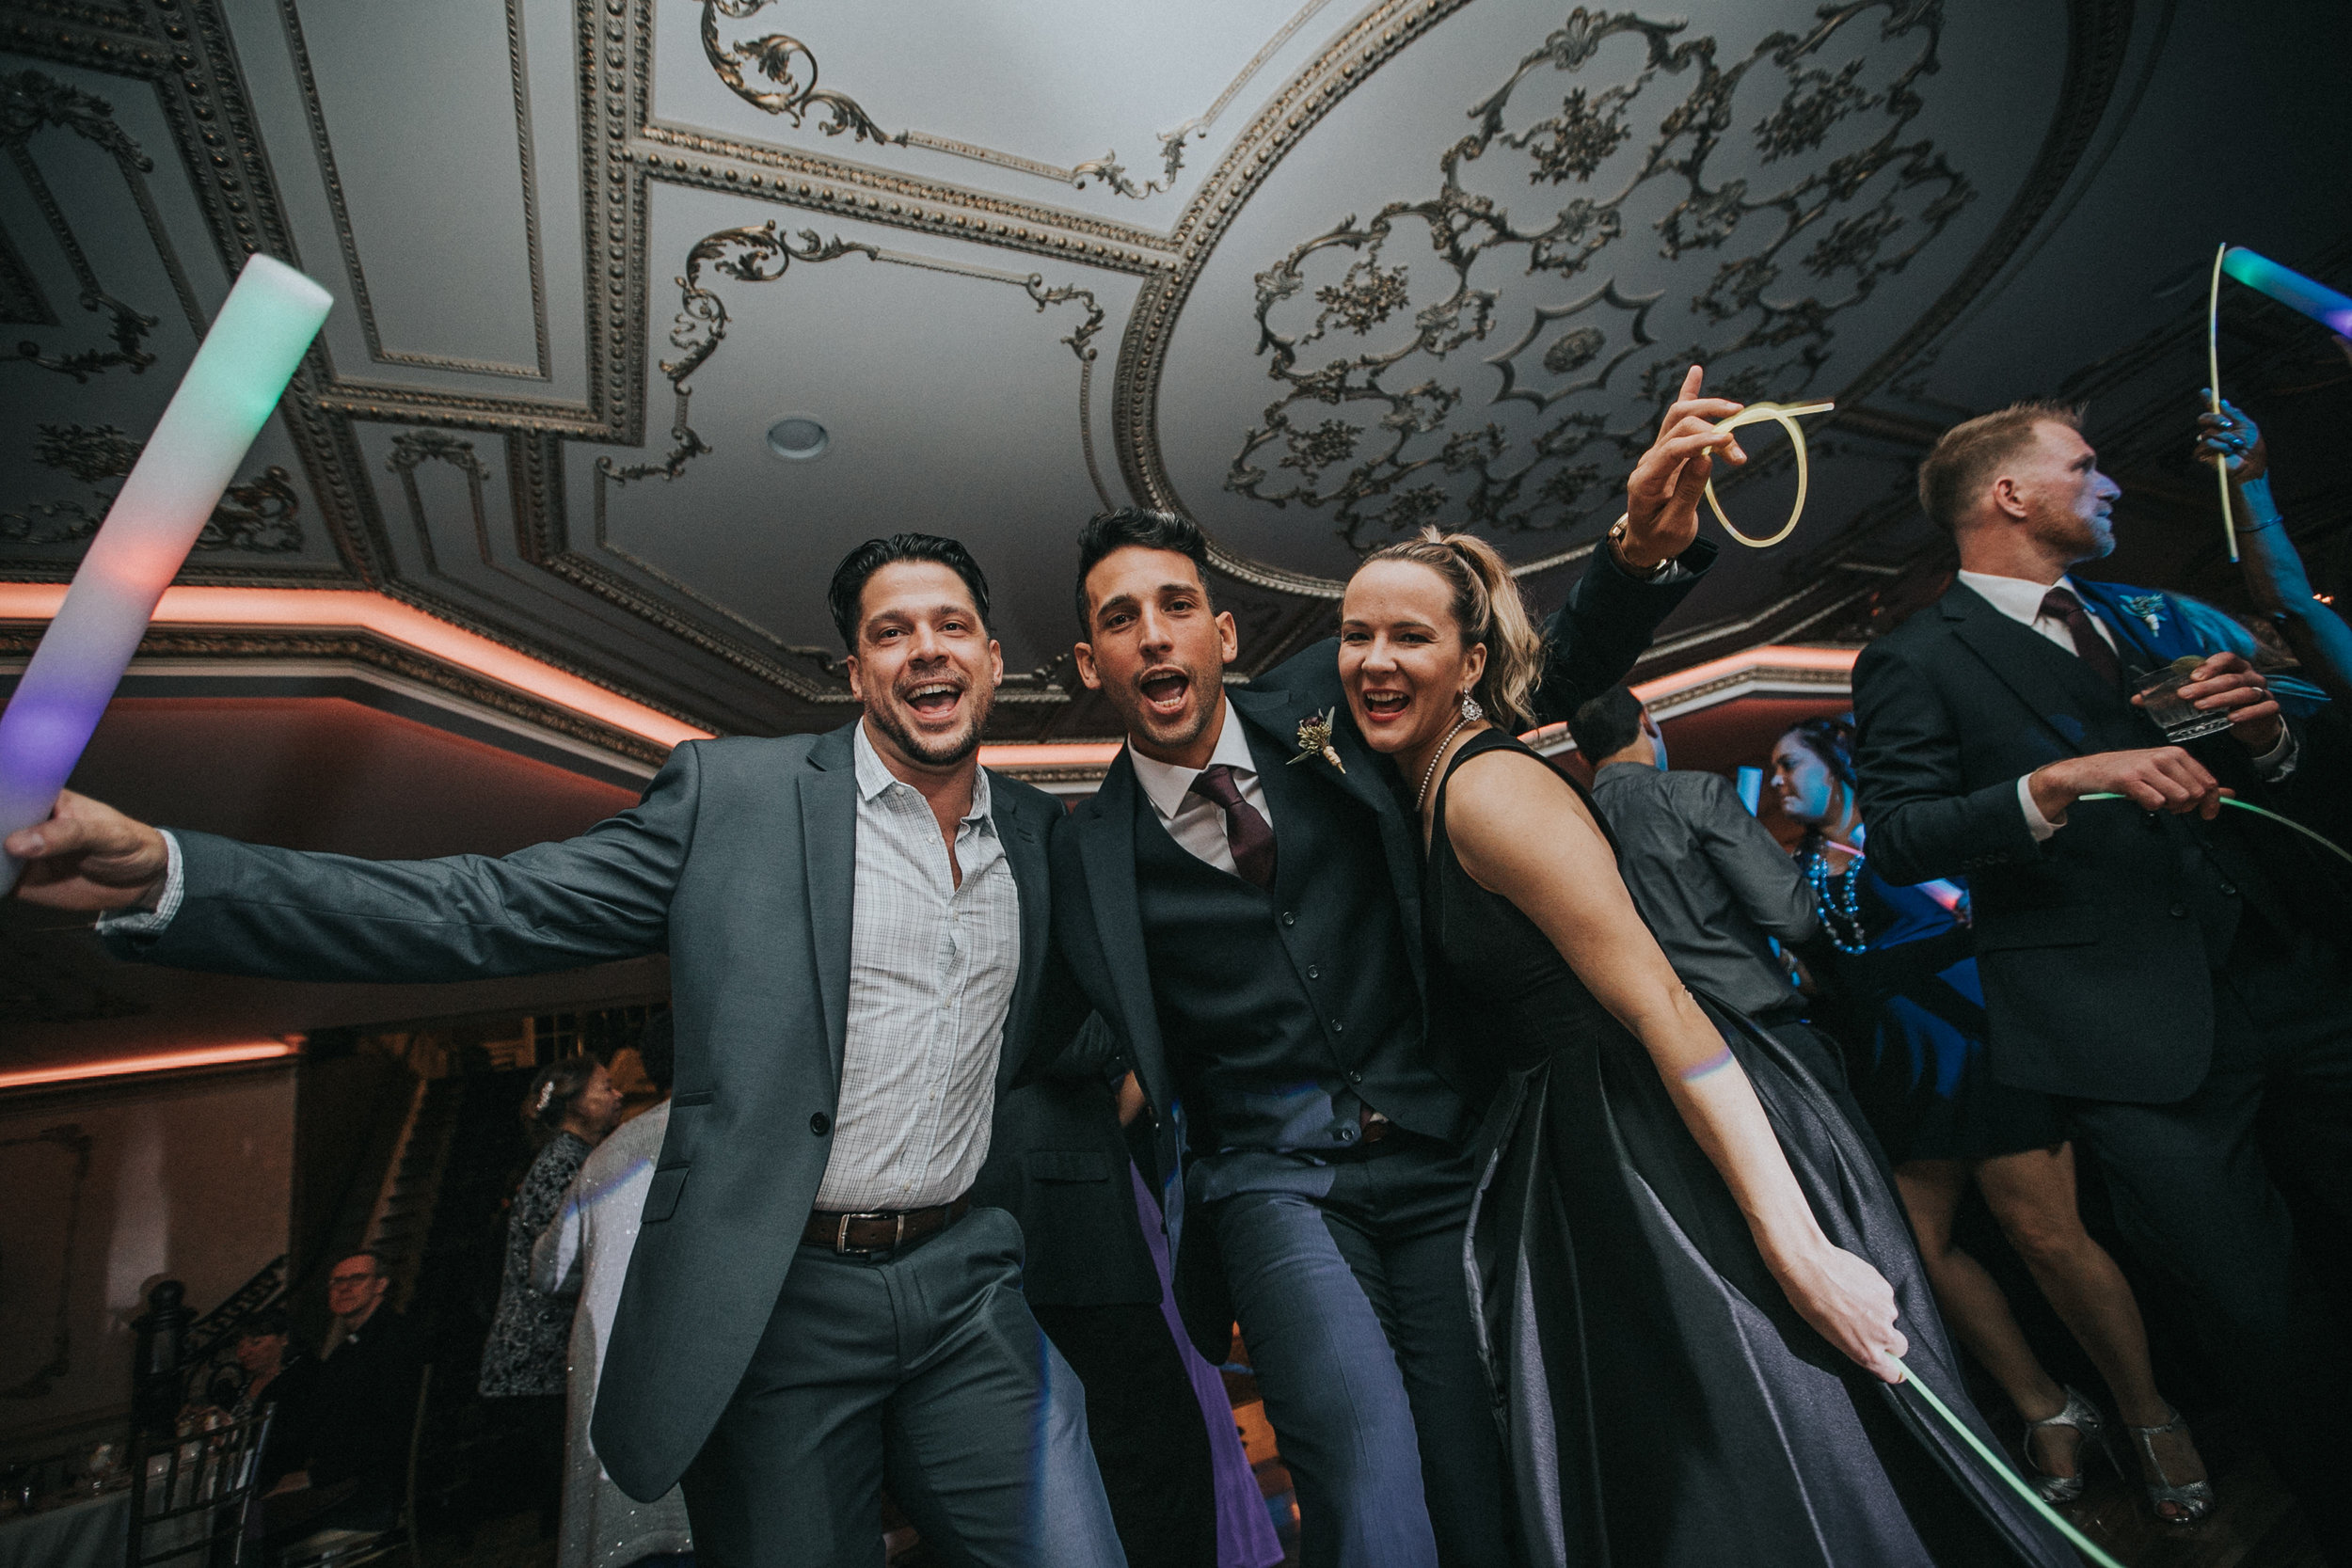 New-Jersey-Wedding-Photography-Brigalias-Deanna&Darryl-Reception-249.jpg